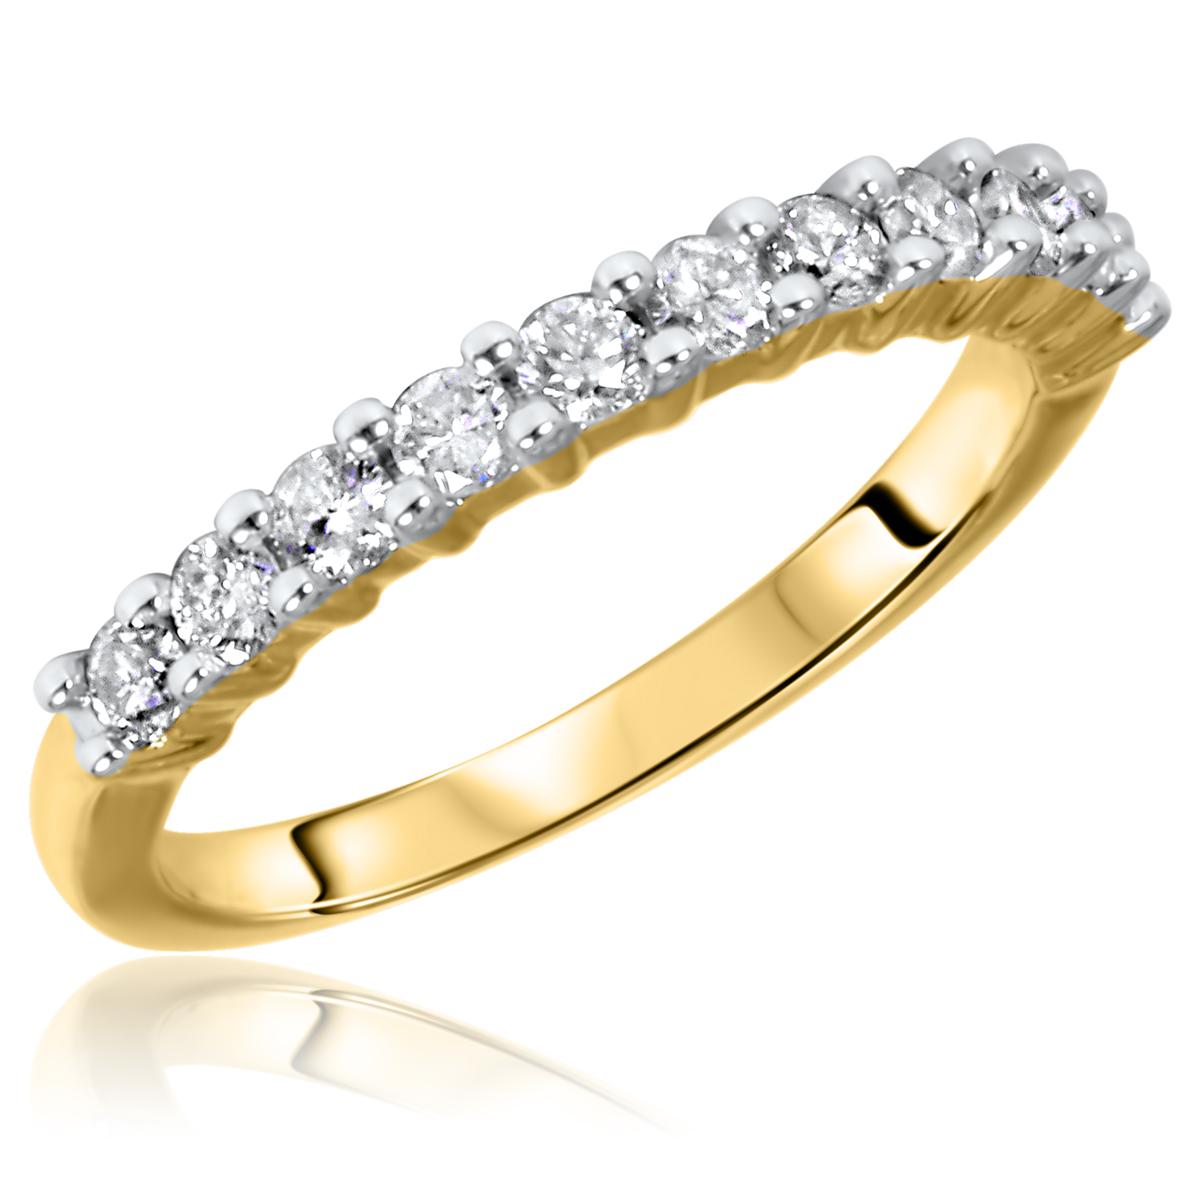 1/2 Carat T.W. Round Cut 11 Stone Diamond Anniversary Ladies Band 14K Yellow